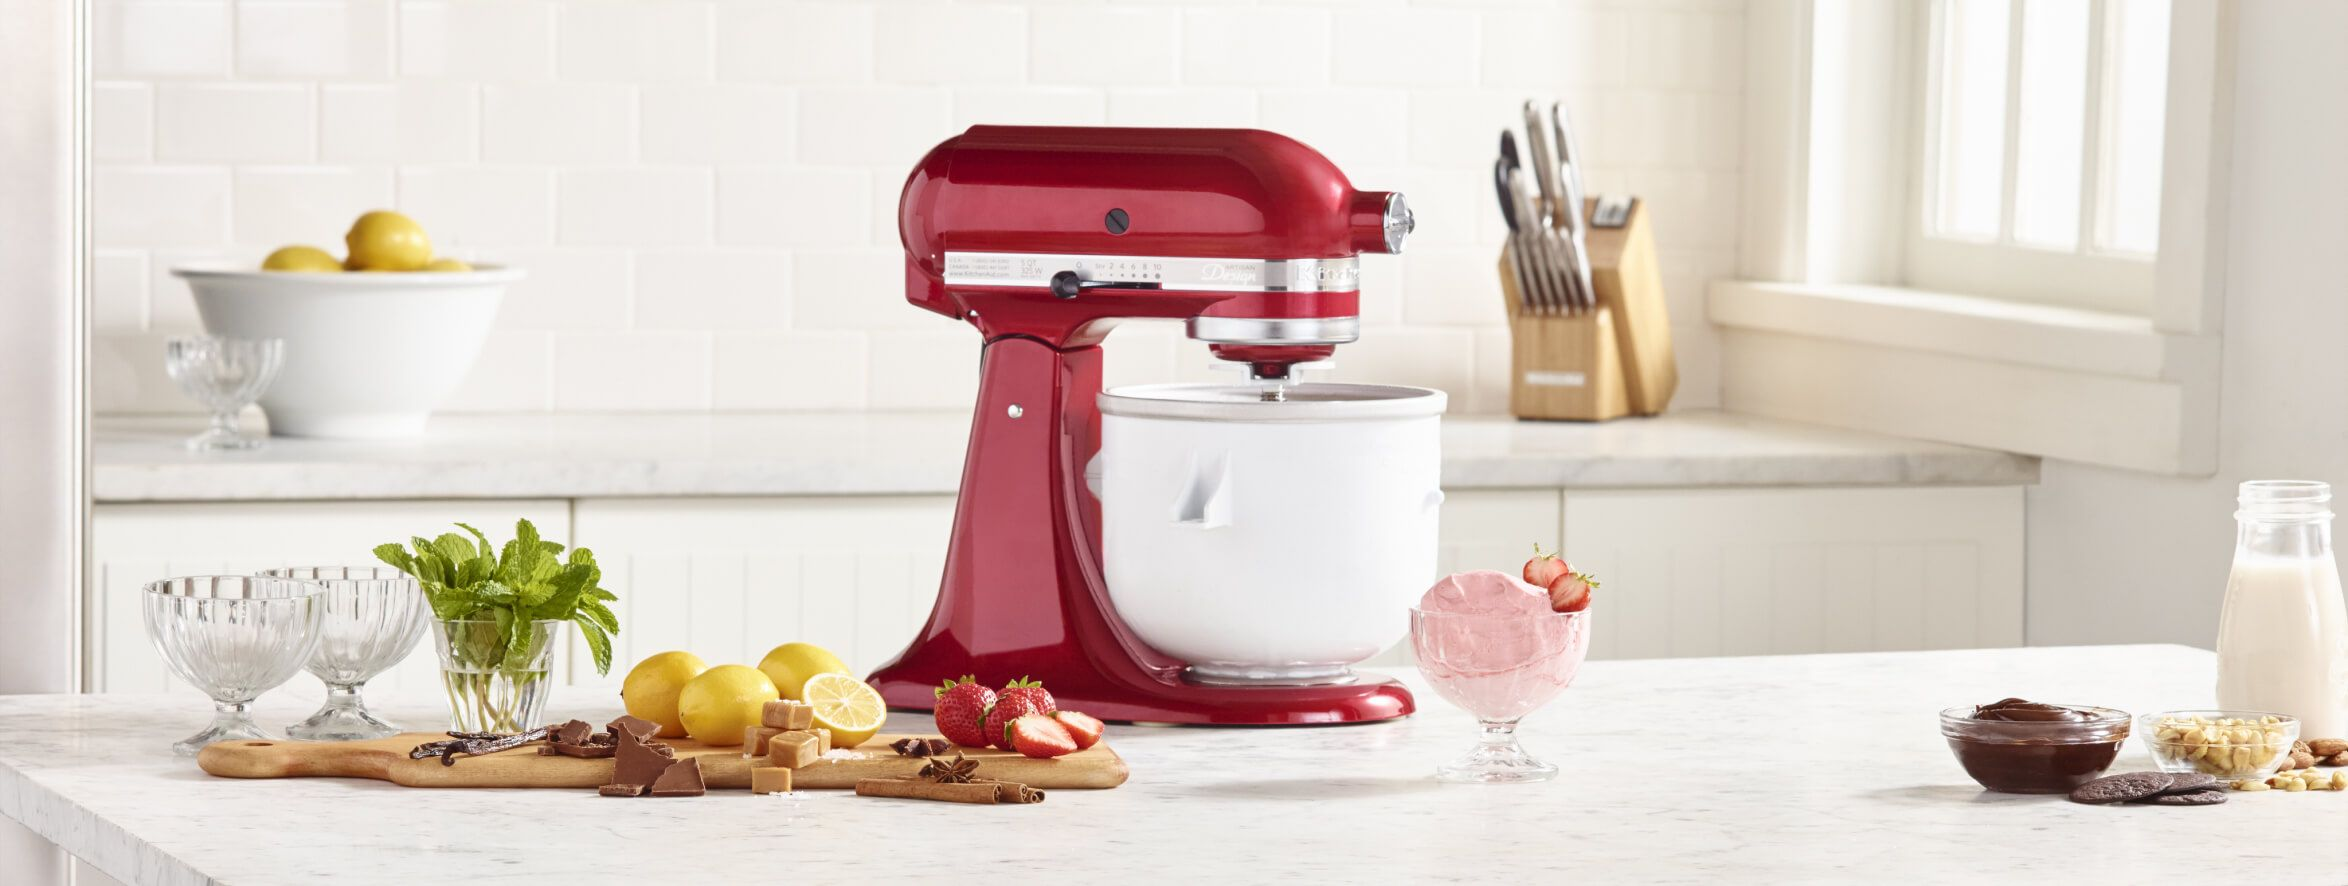 Ingredients for making homemade frozen yogurt in a KitchenAid® stand mixer.